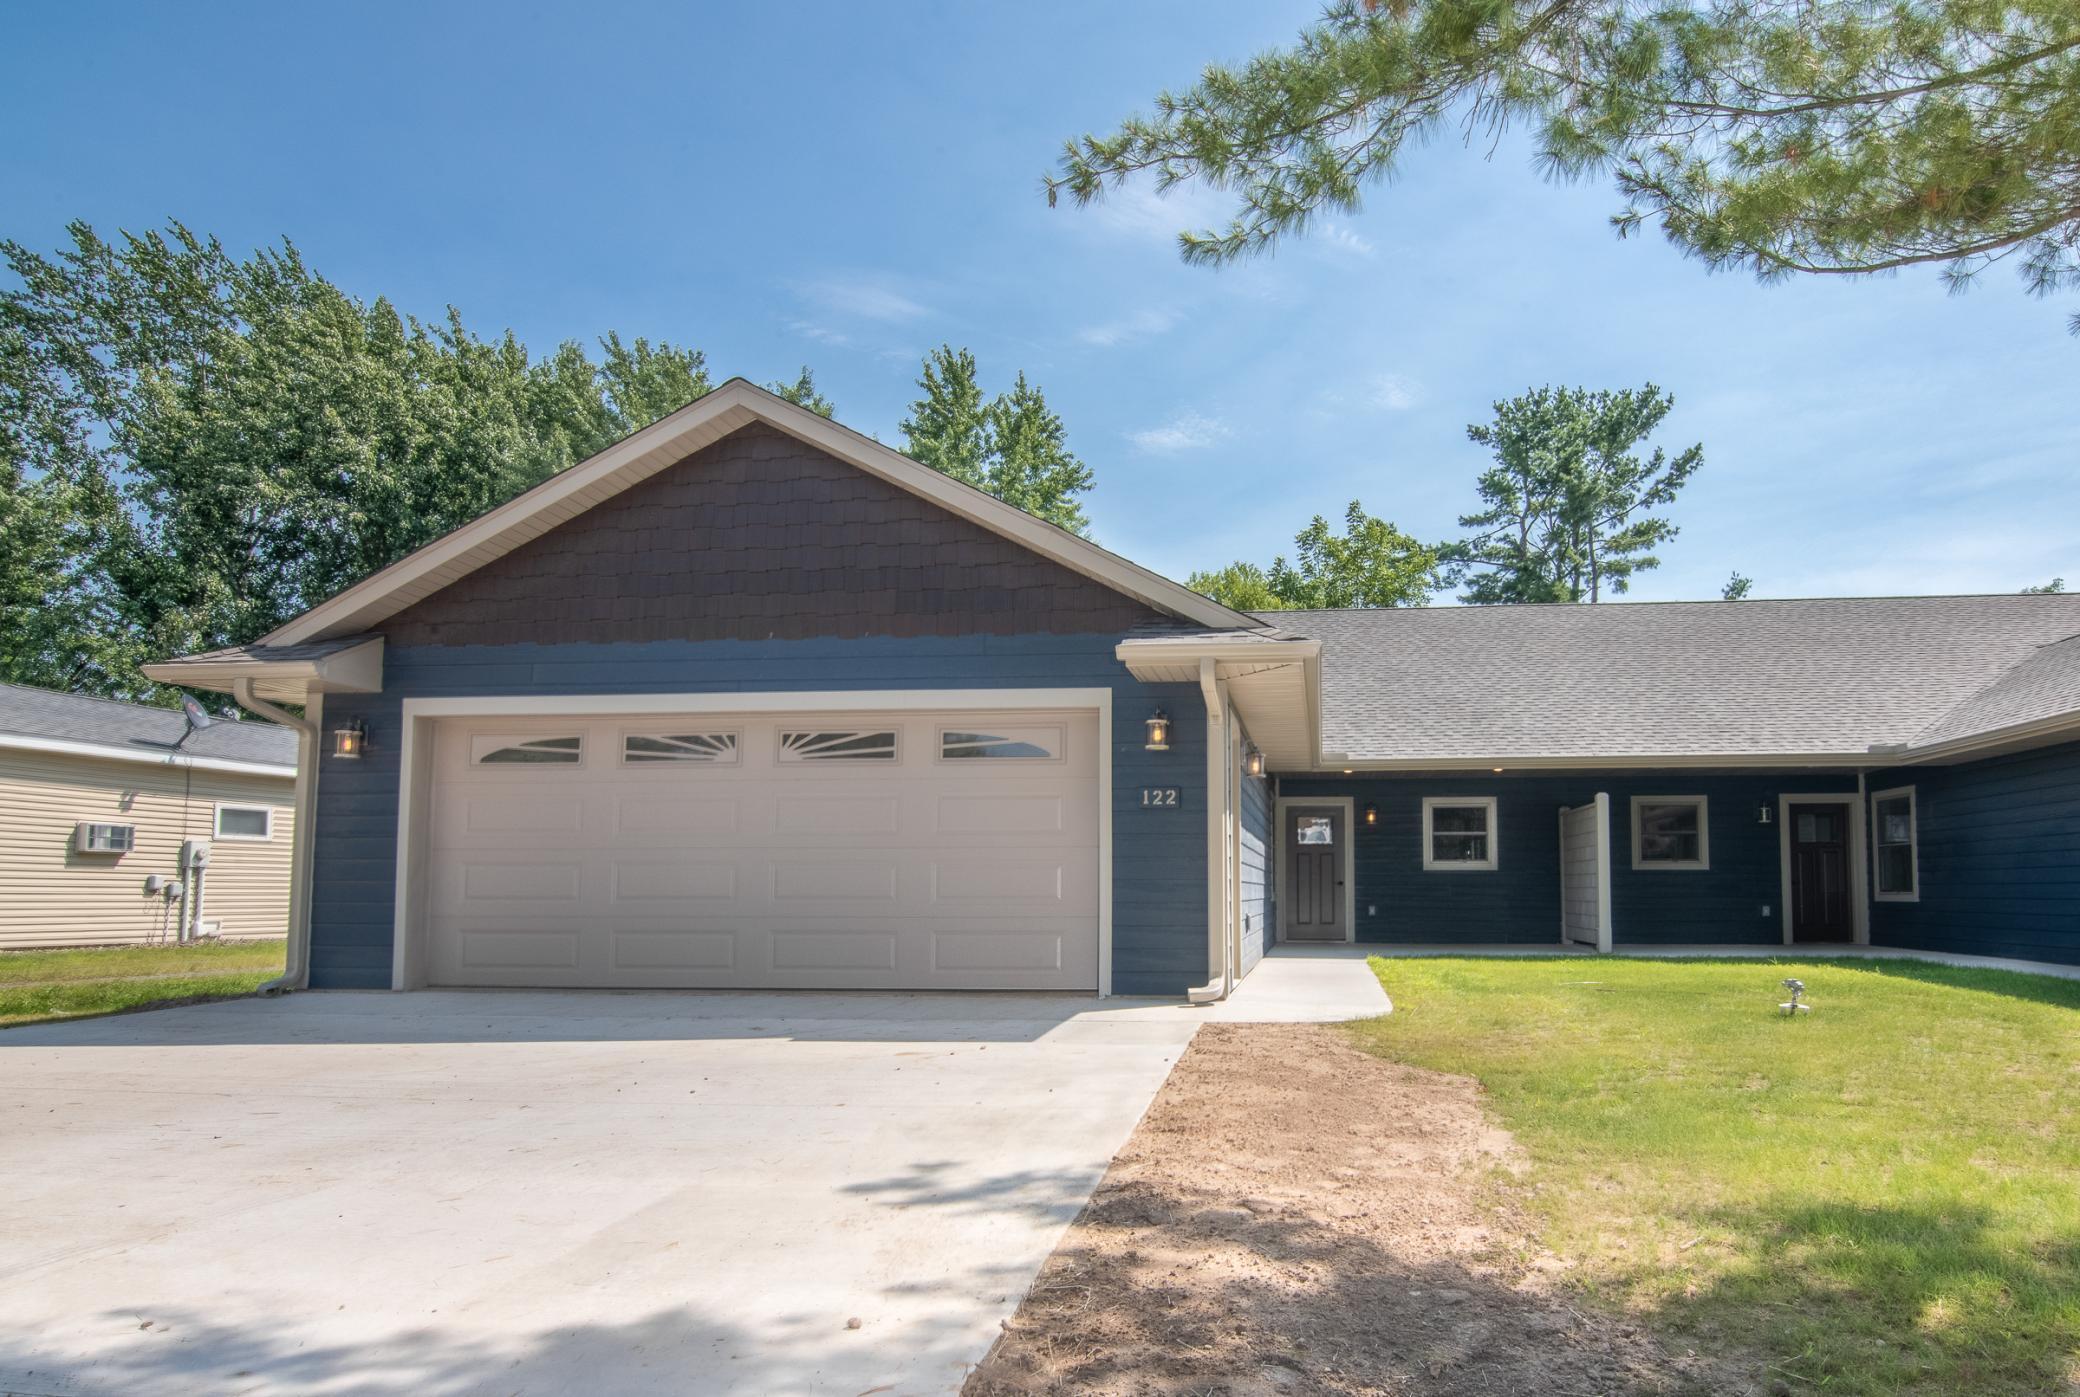 122 Pine Street N Property Photo - Turtle Lake, WI real estate listing